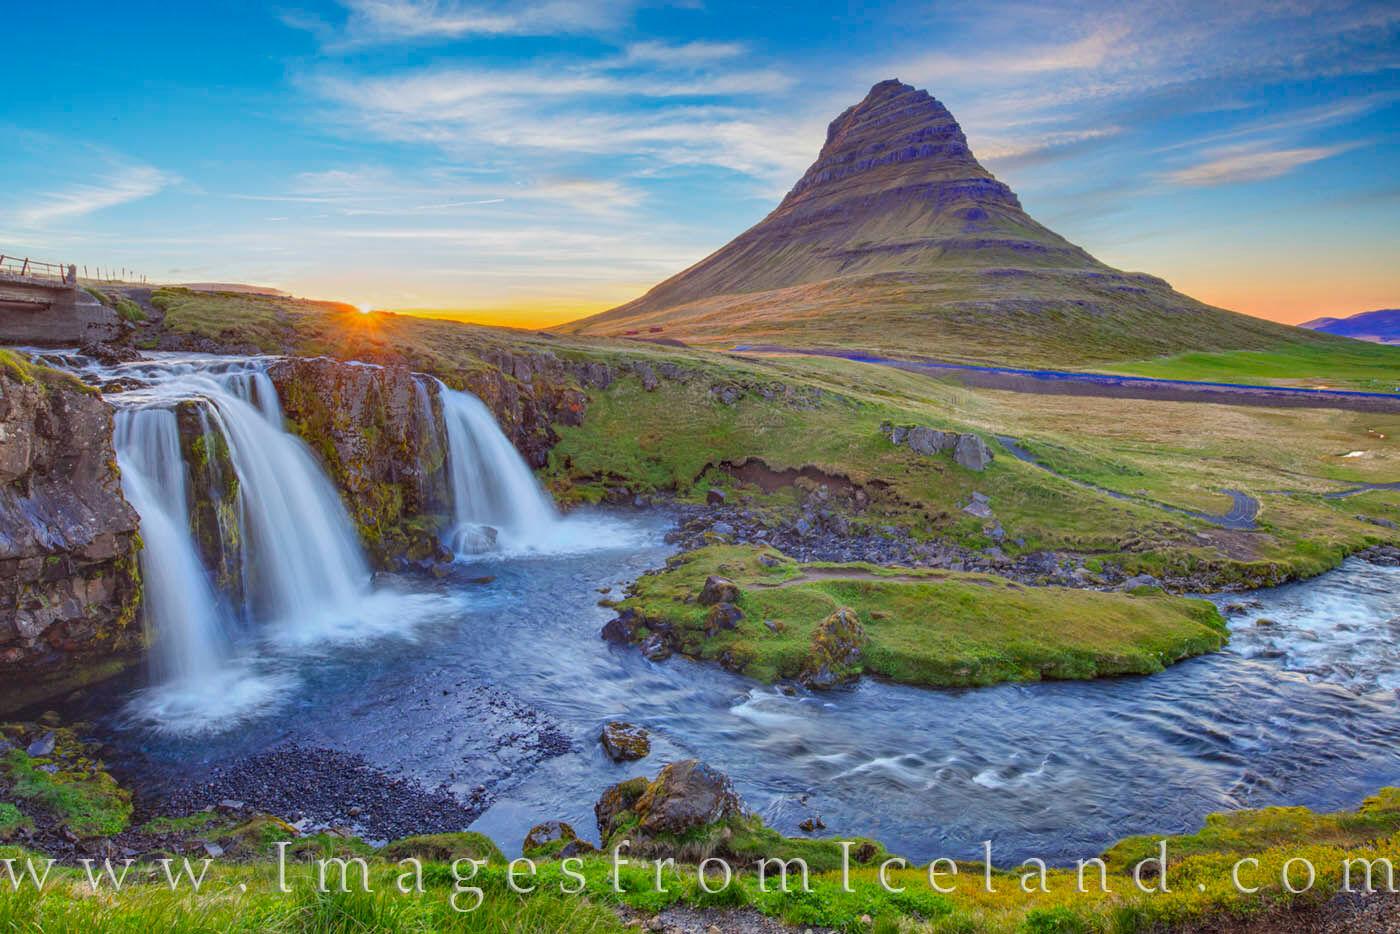 Grundarfjörður, Kirkjufellfoss, Kirkjufell, iceland, waterfall, icon, summer, night, west icelan, iceland prints, travel, Snæfellsnes Peninsula